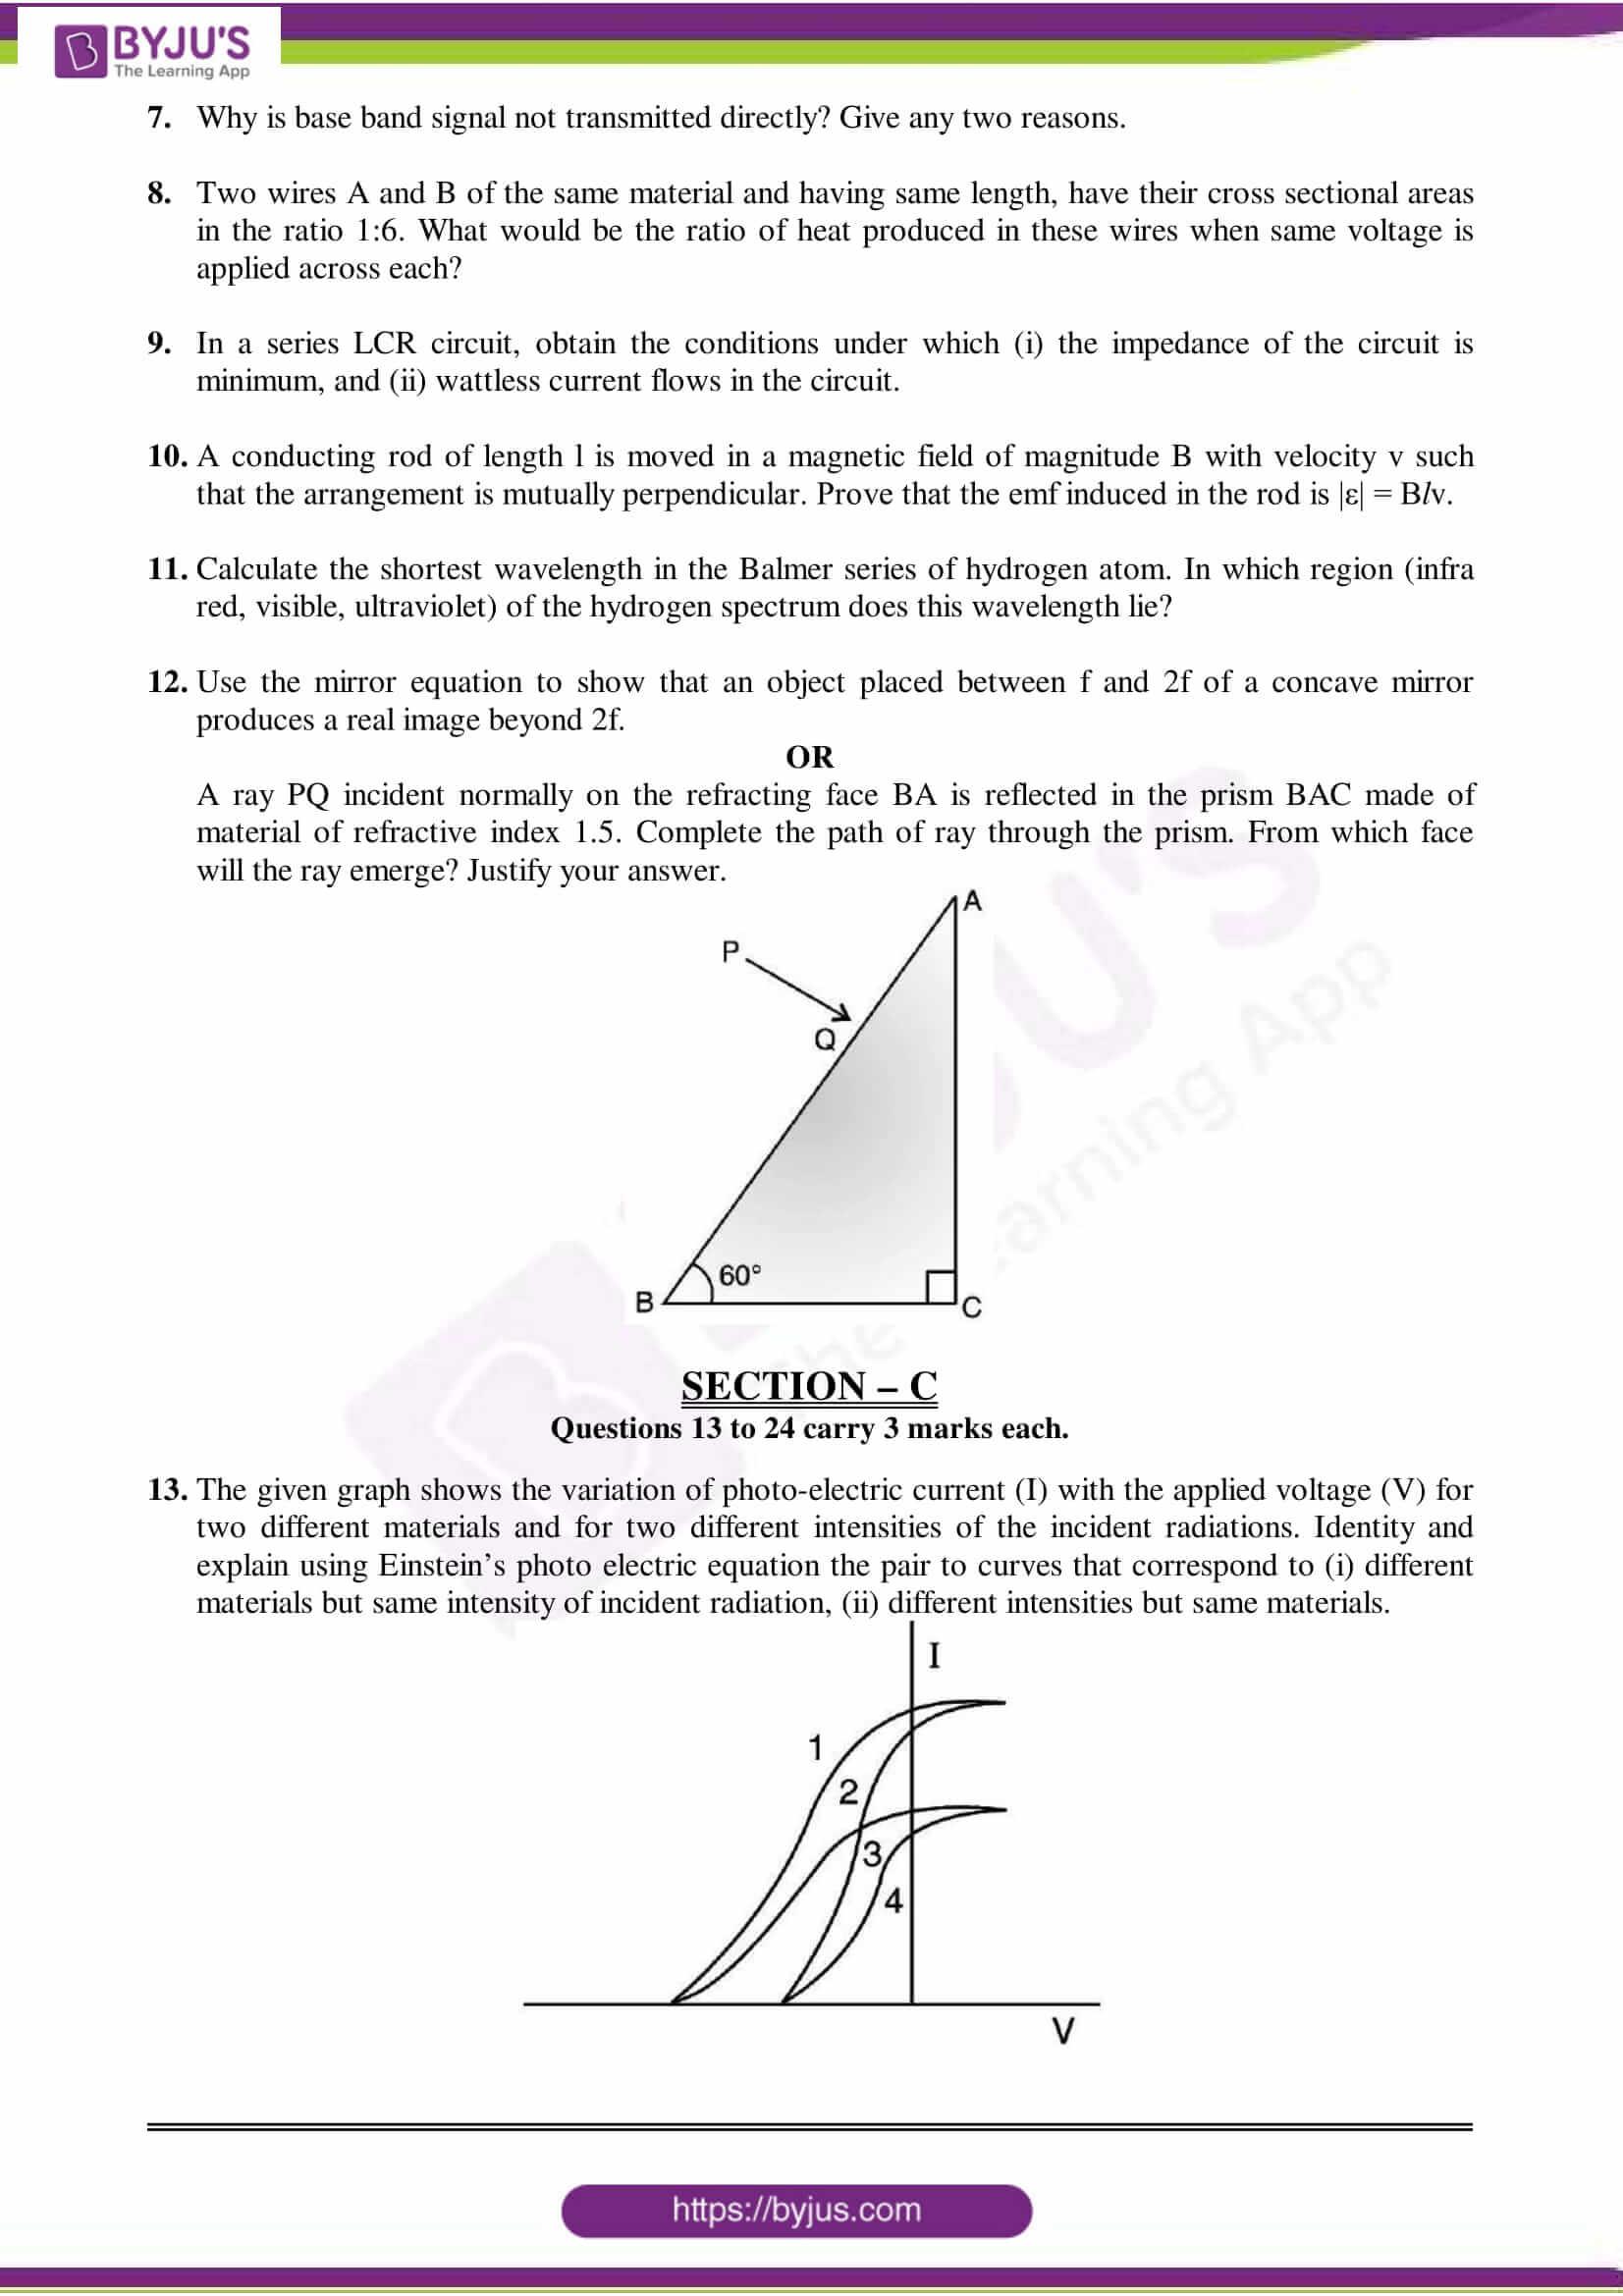 cbse class 12 physics sample paper set 6